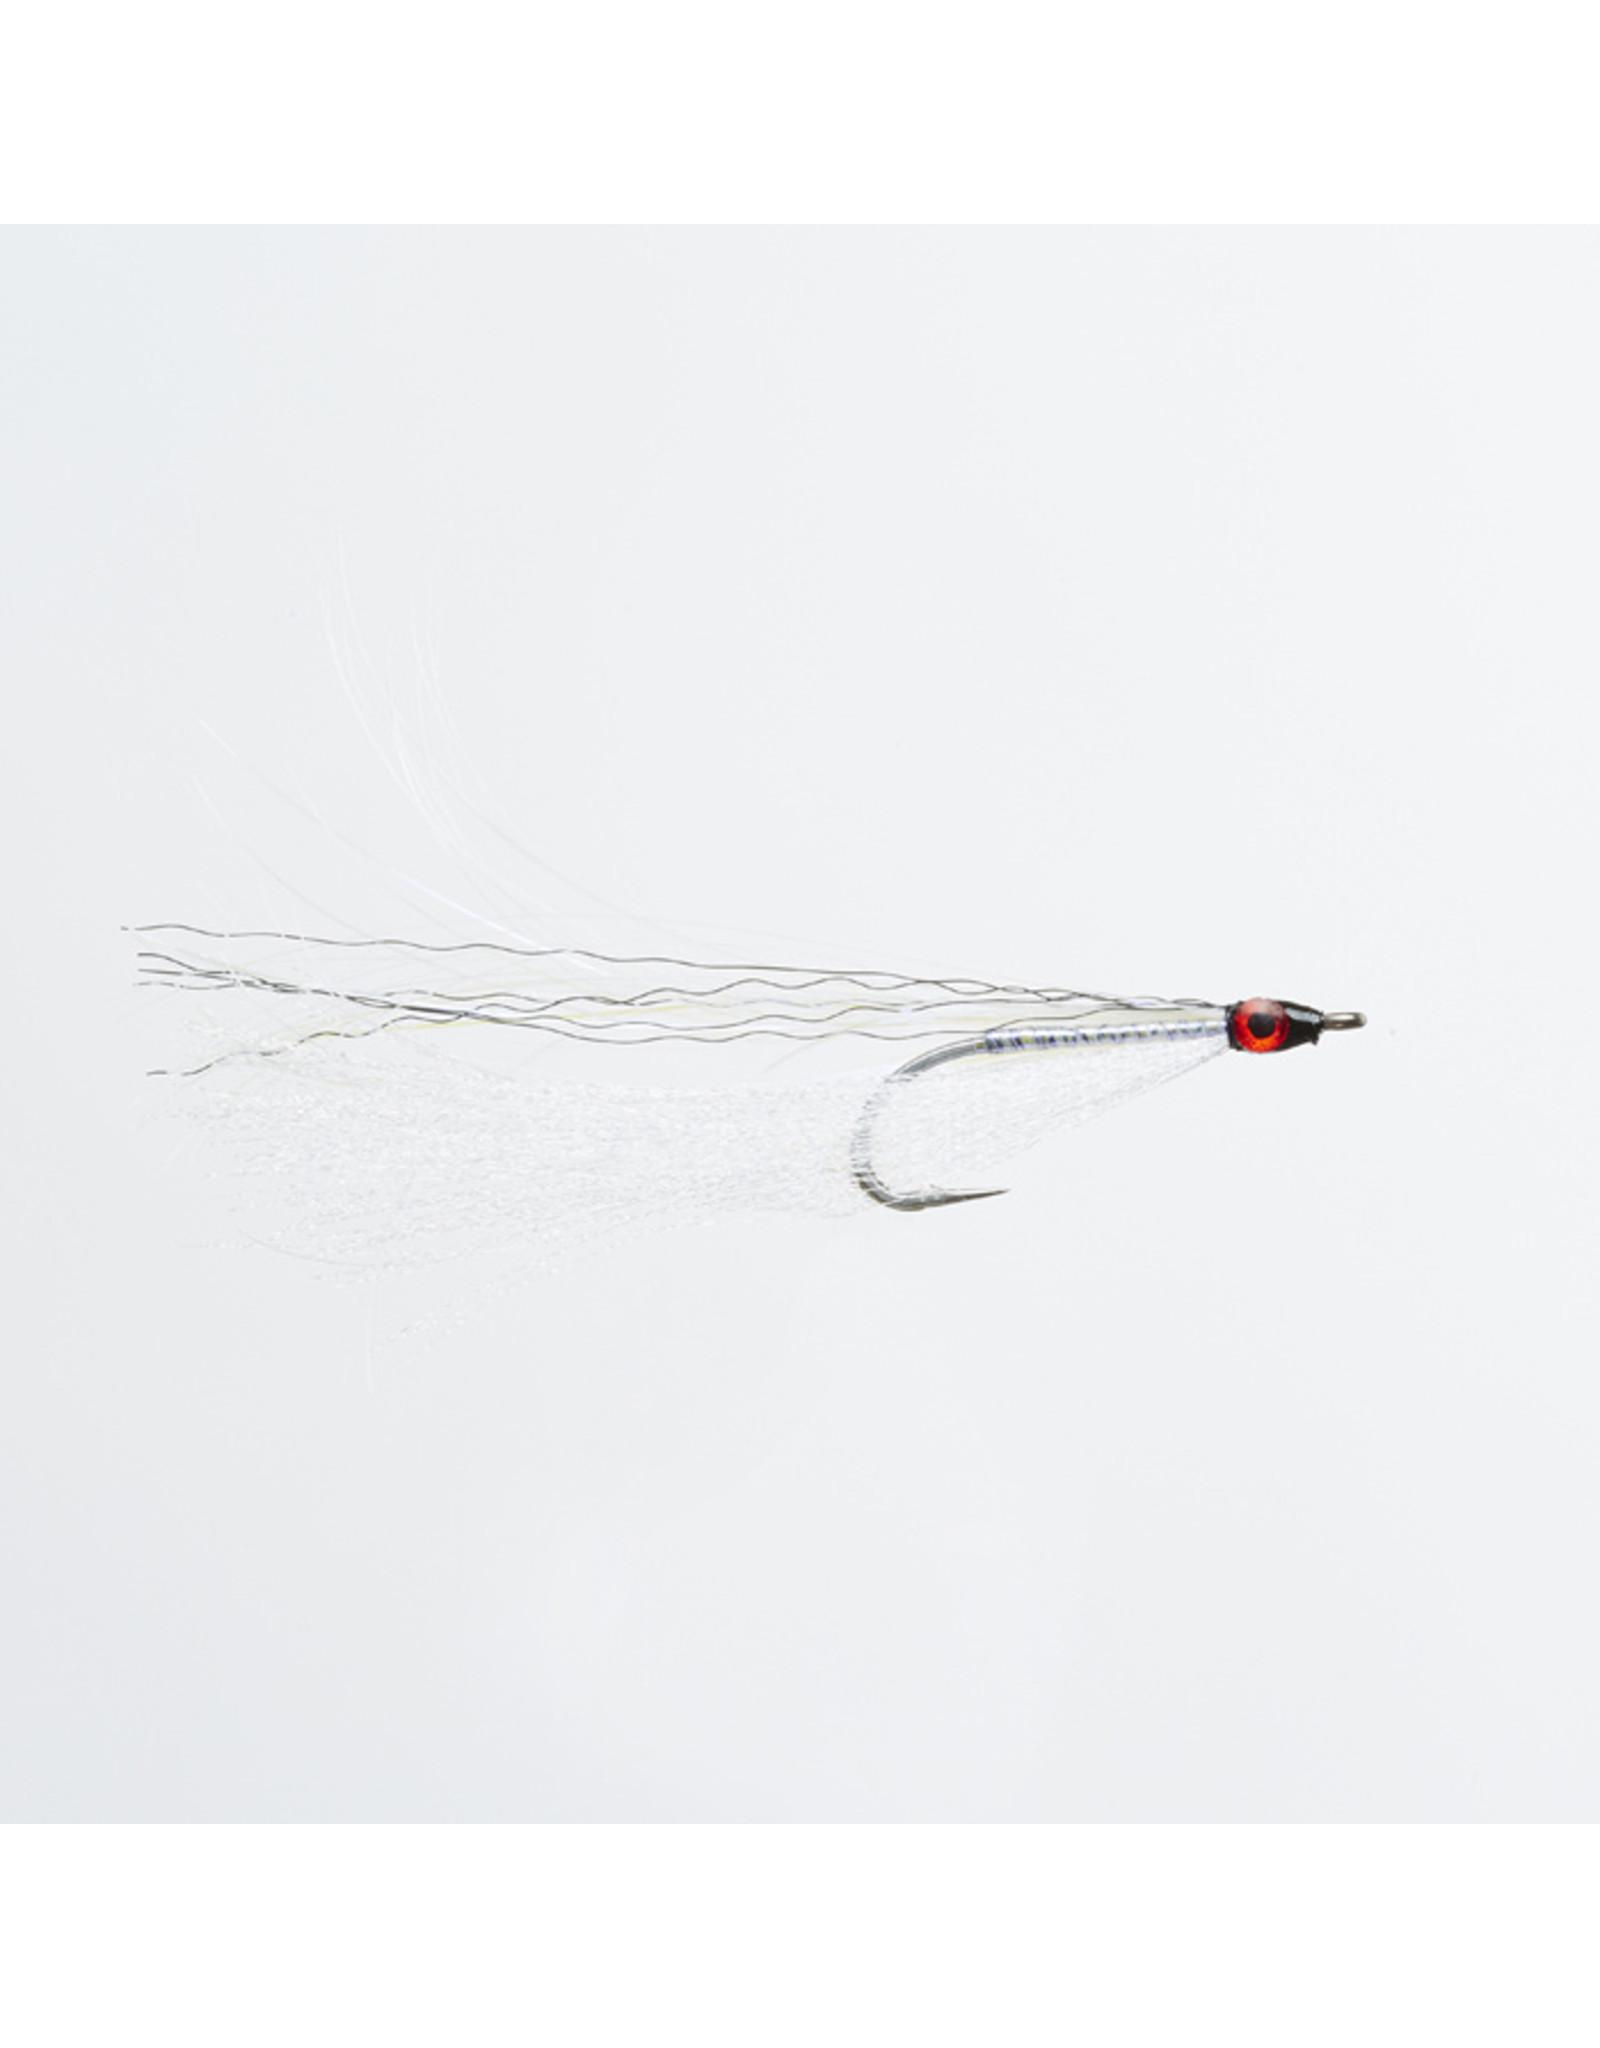 Turrall Turrall Silver Baitfish